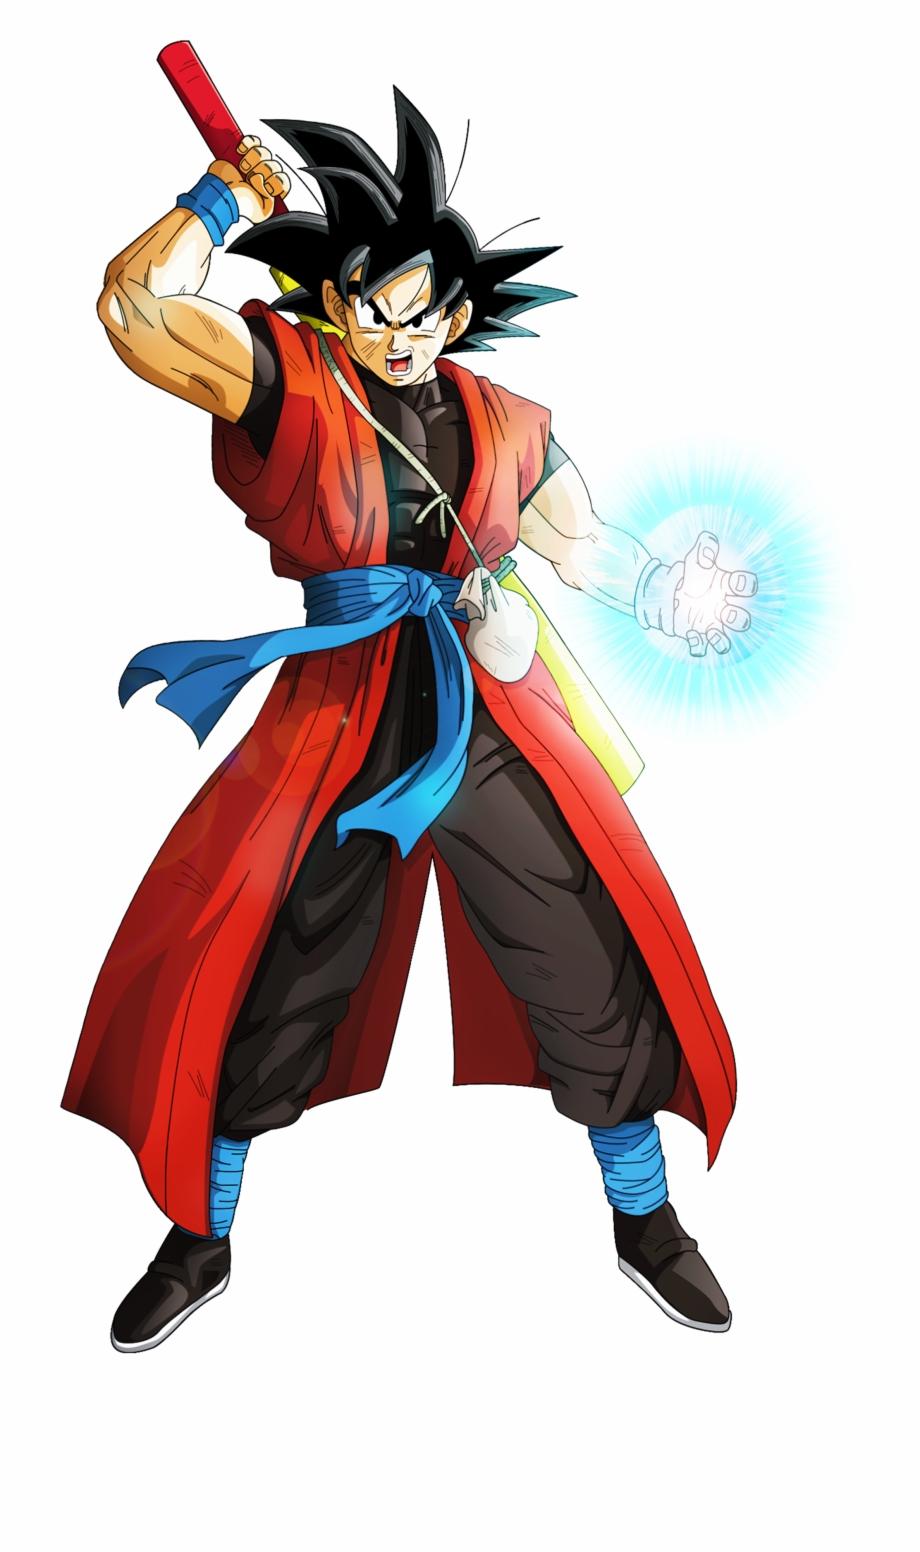 Super Saiyan.